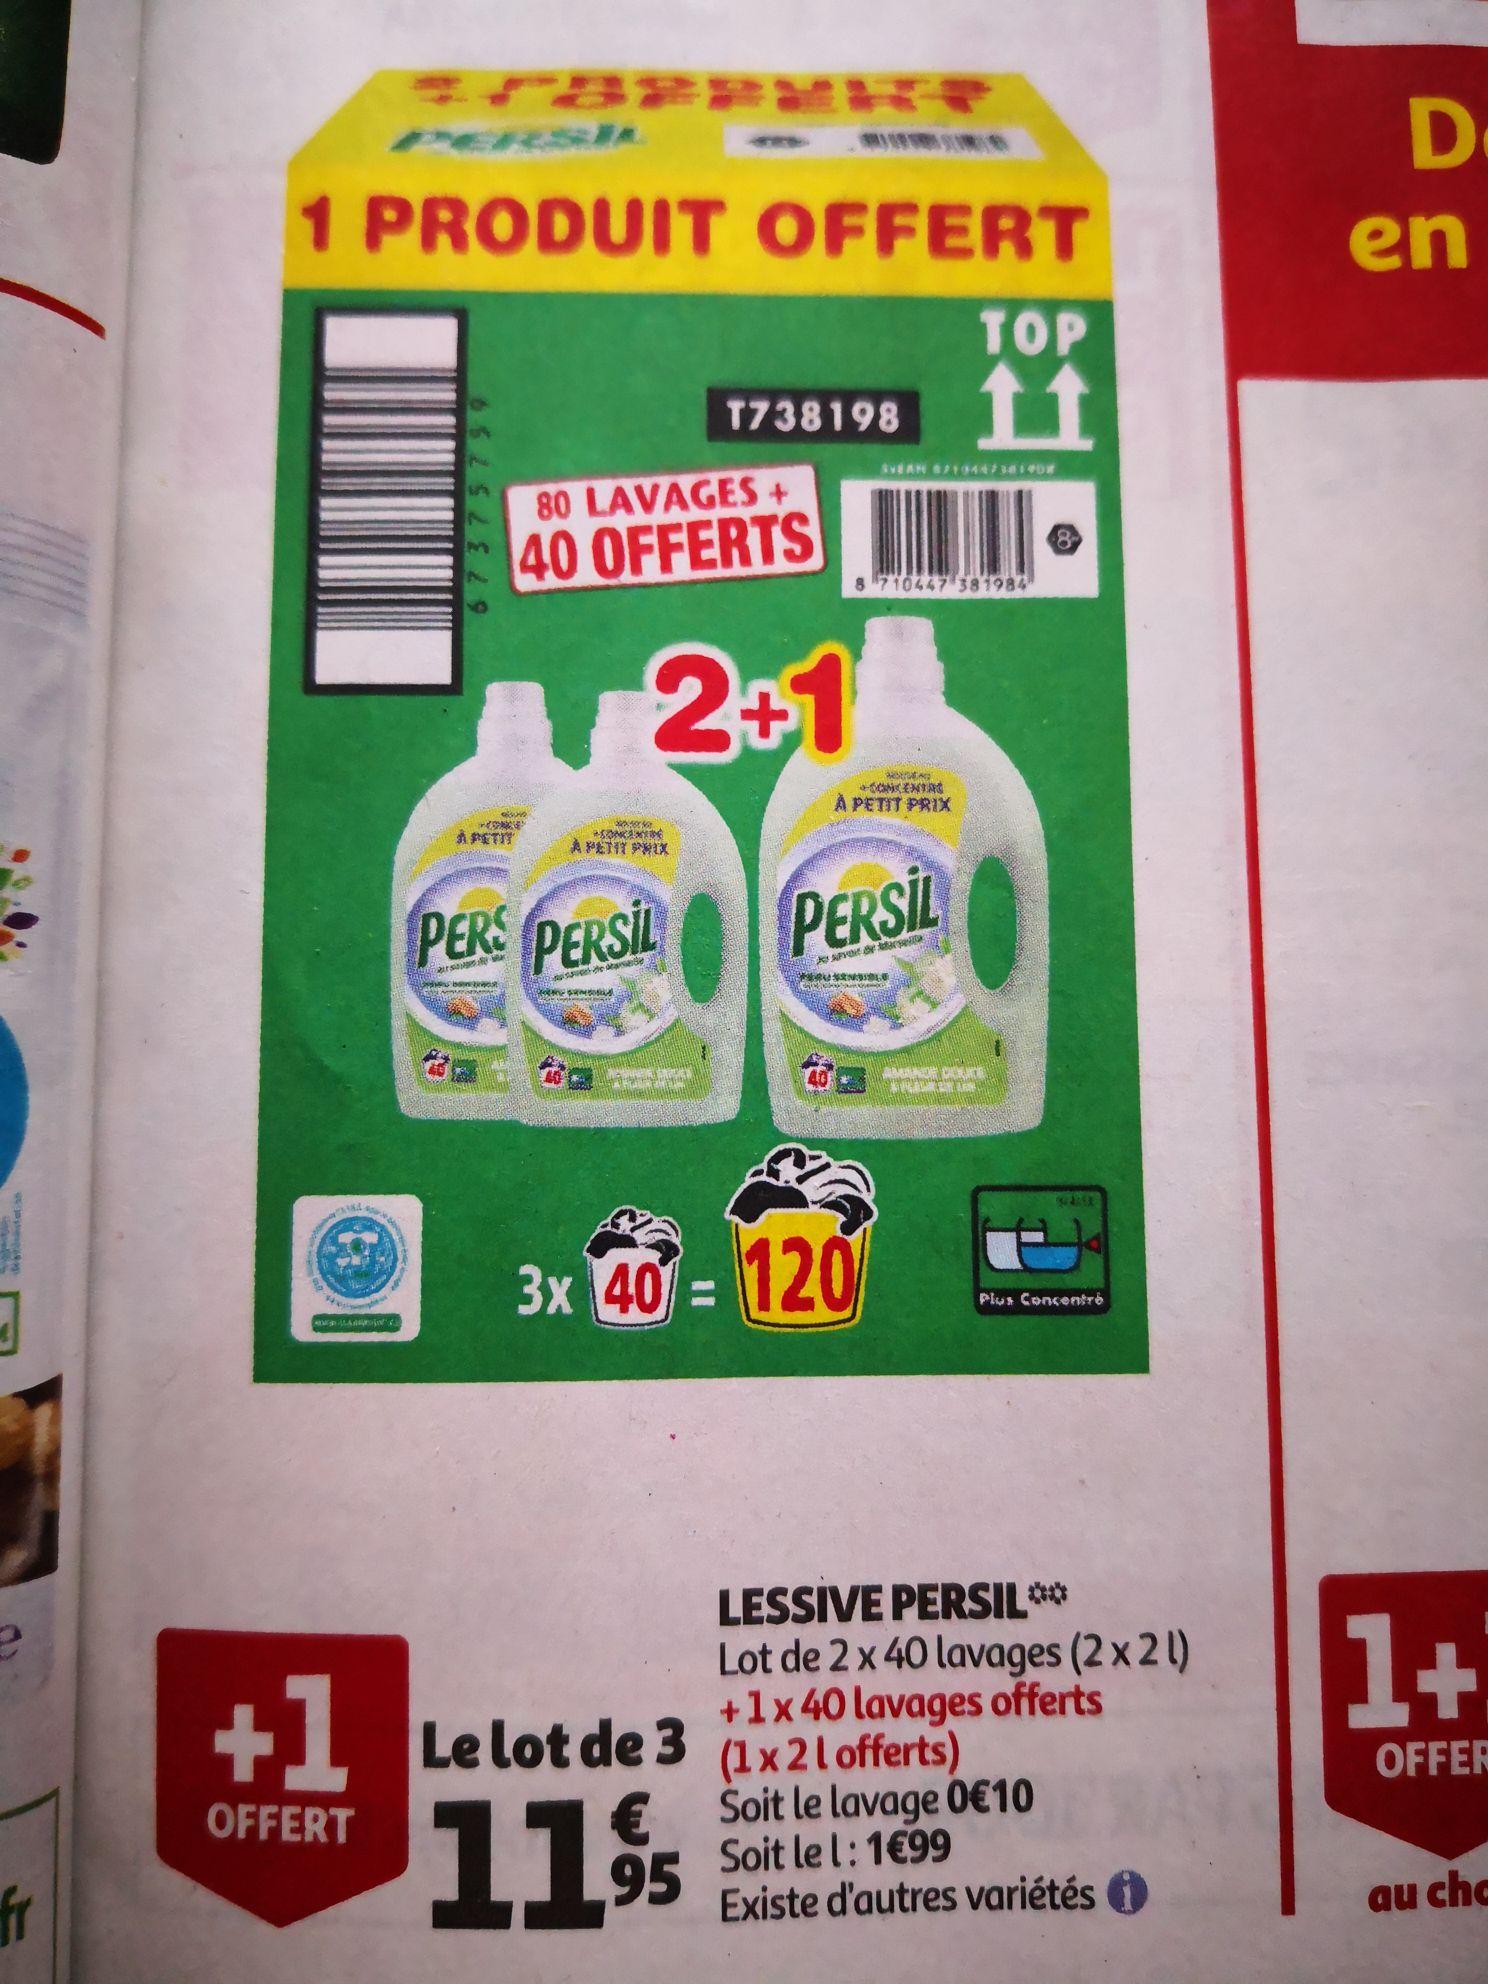 Lot de 3 bidons de lessive liquide Persil - 3 x 2 litres (Plusieurs variétés)